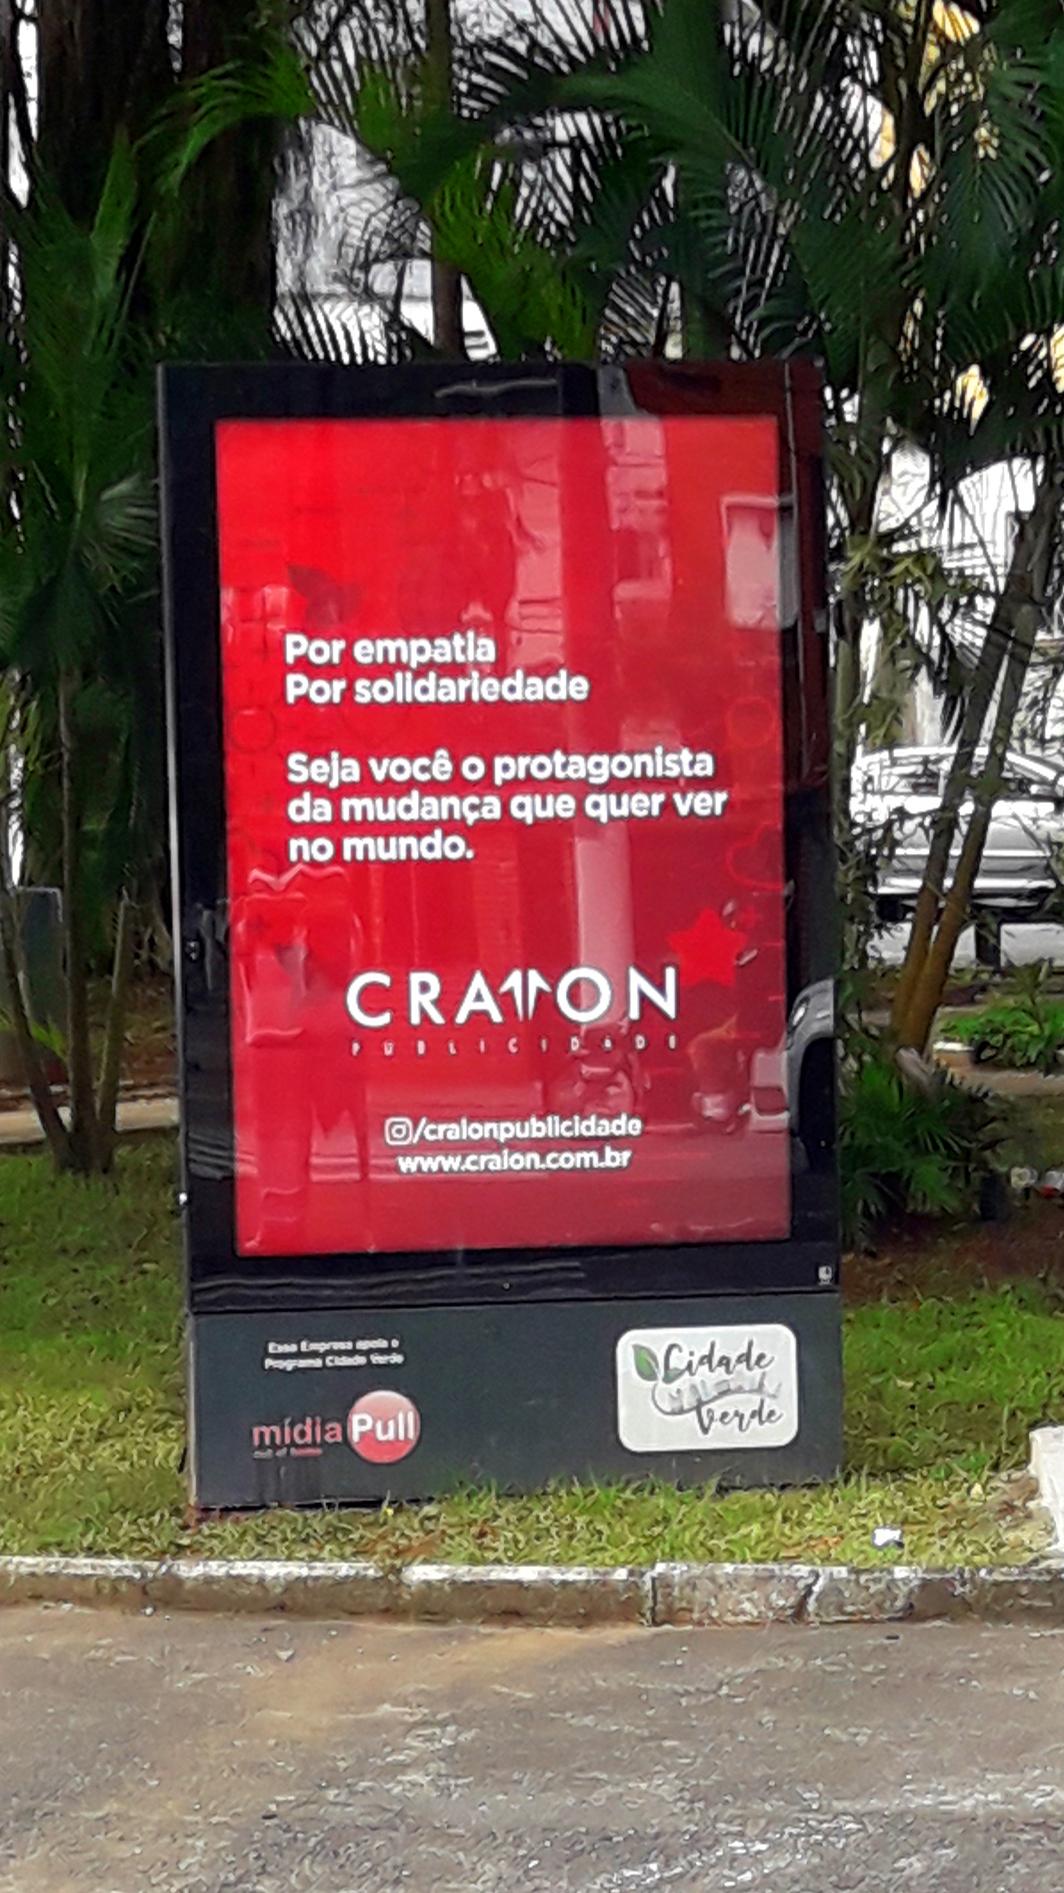 Craion Publicidade